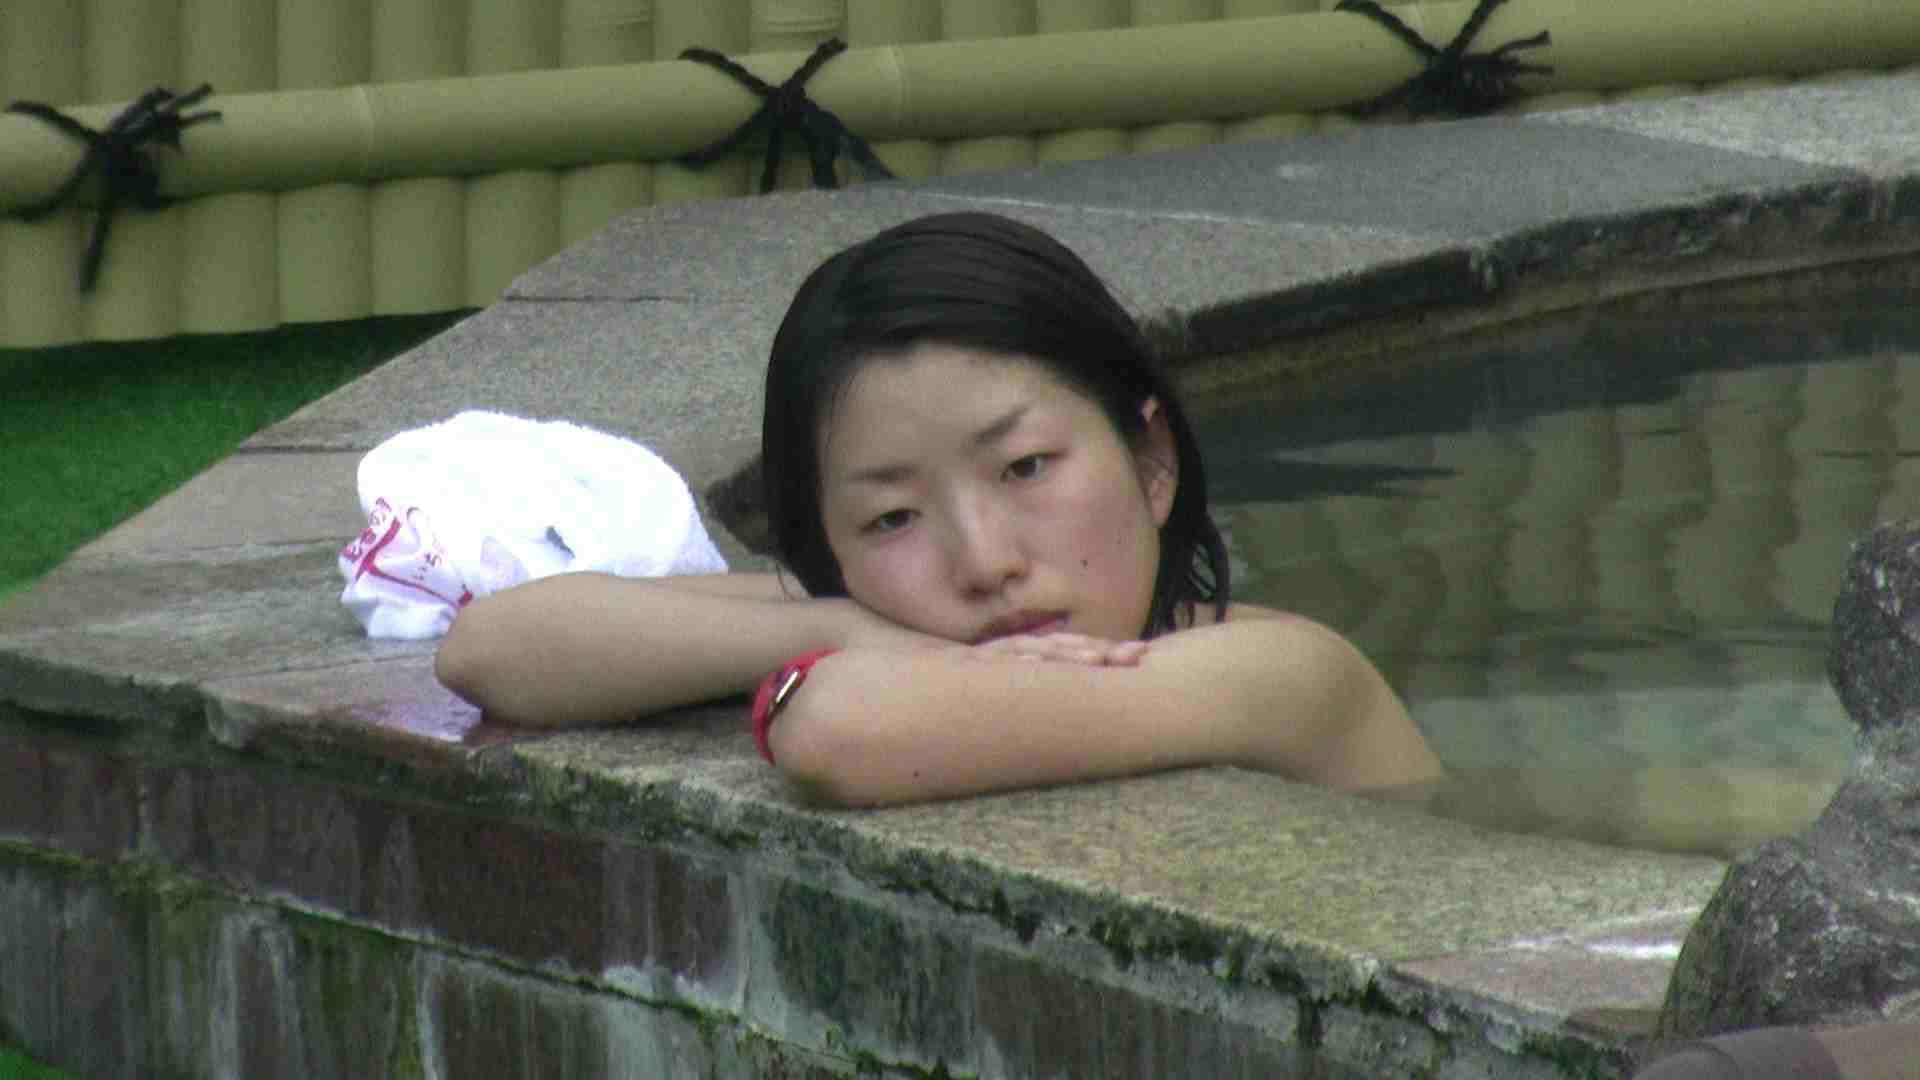 Aquaな露天風呂Vol.133 0 | 0  46連発 15